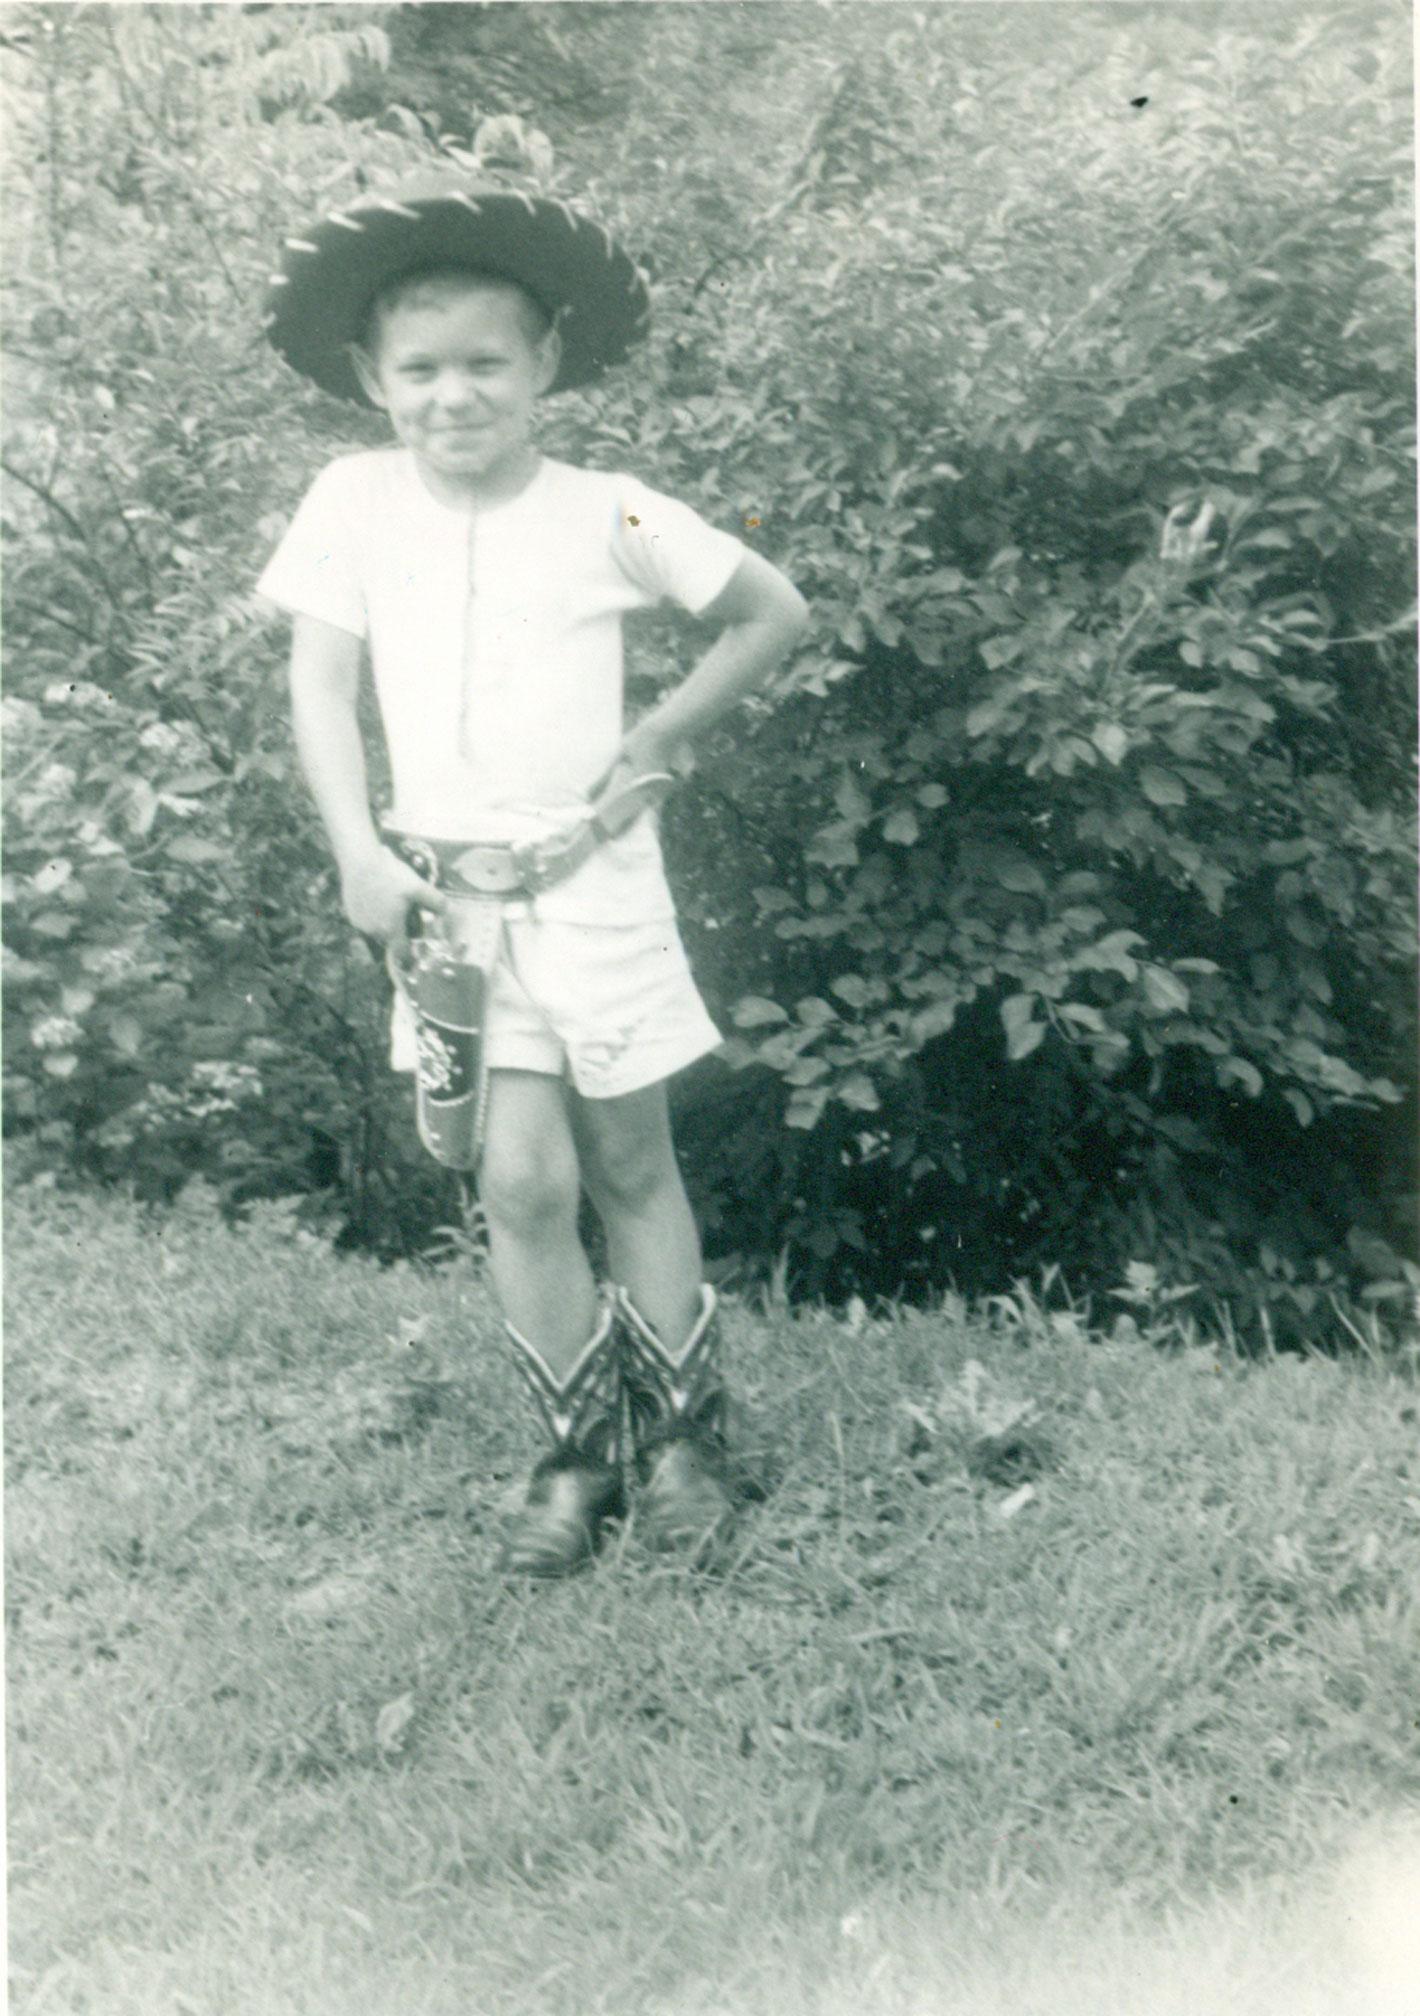 Tom-4th-Bday-1953.jpg